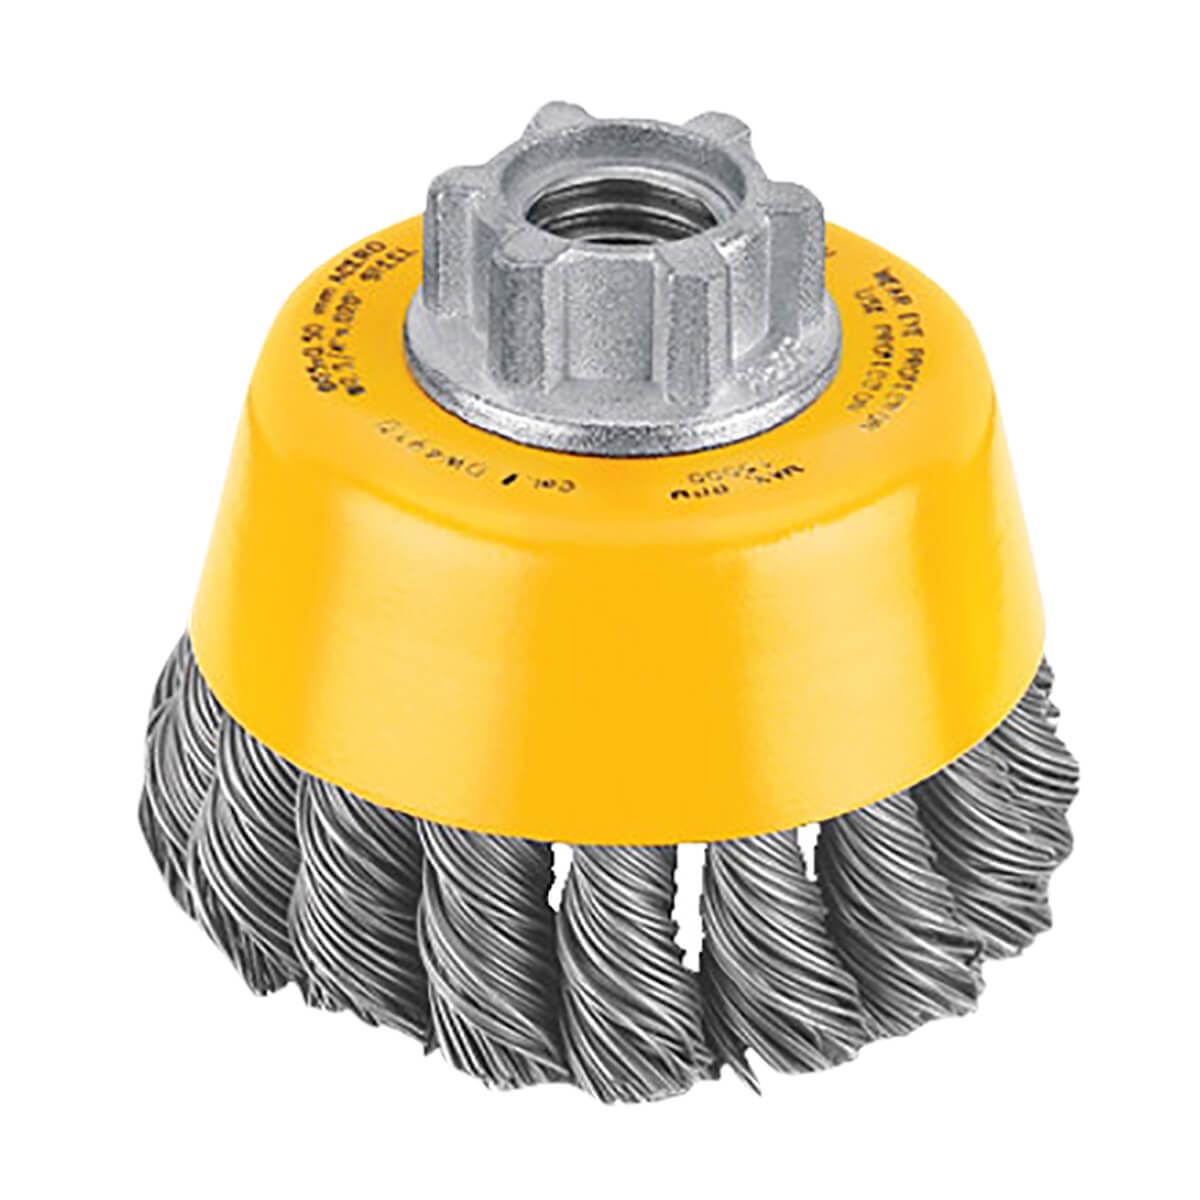 "DEWALT 3"" x 5/8"" - 11 Knotted Cup Brush/Carbon Steel .020"" - DW4910"